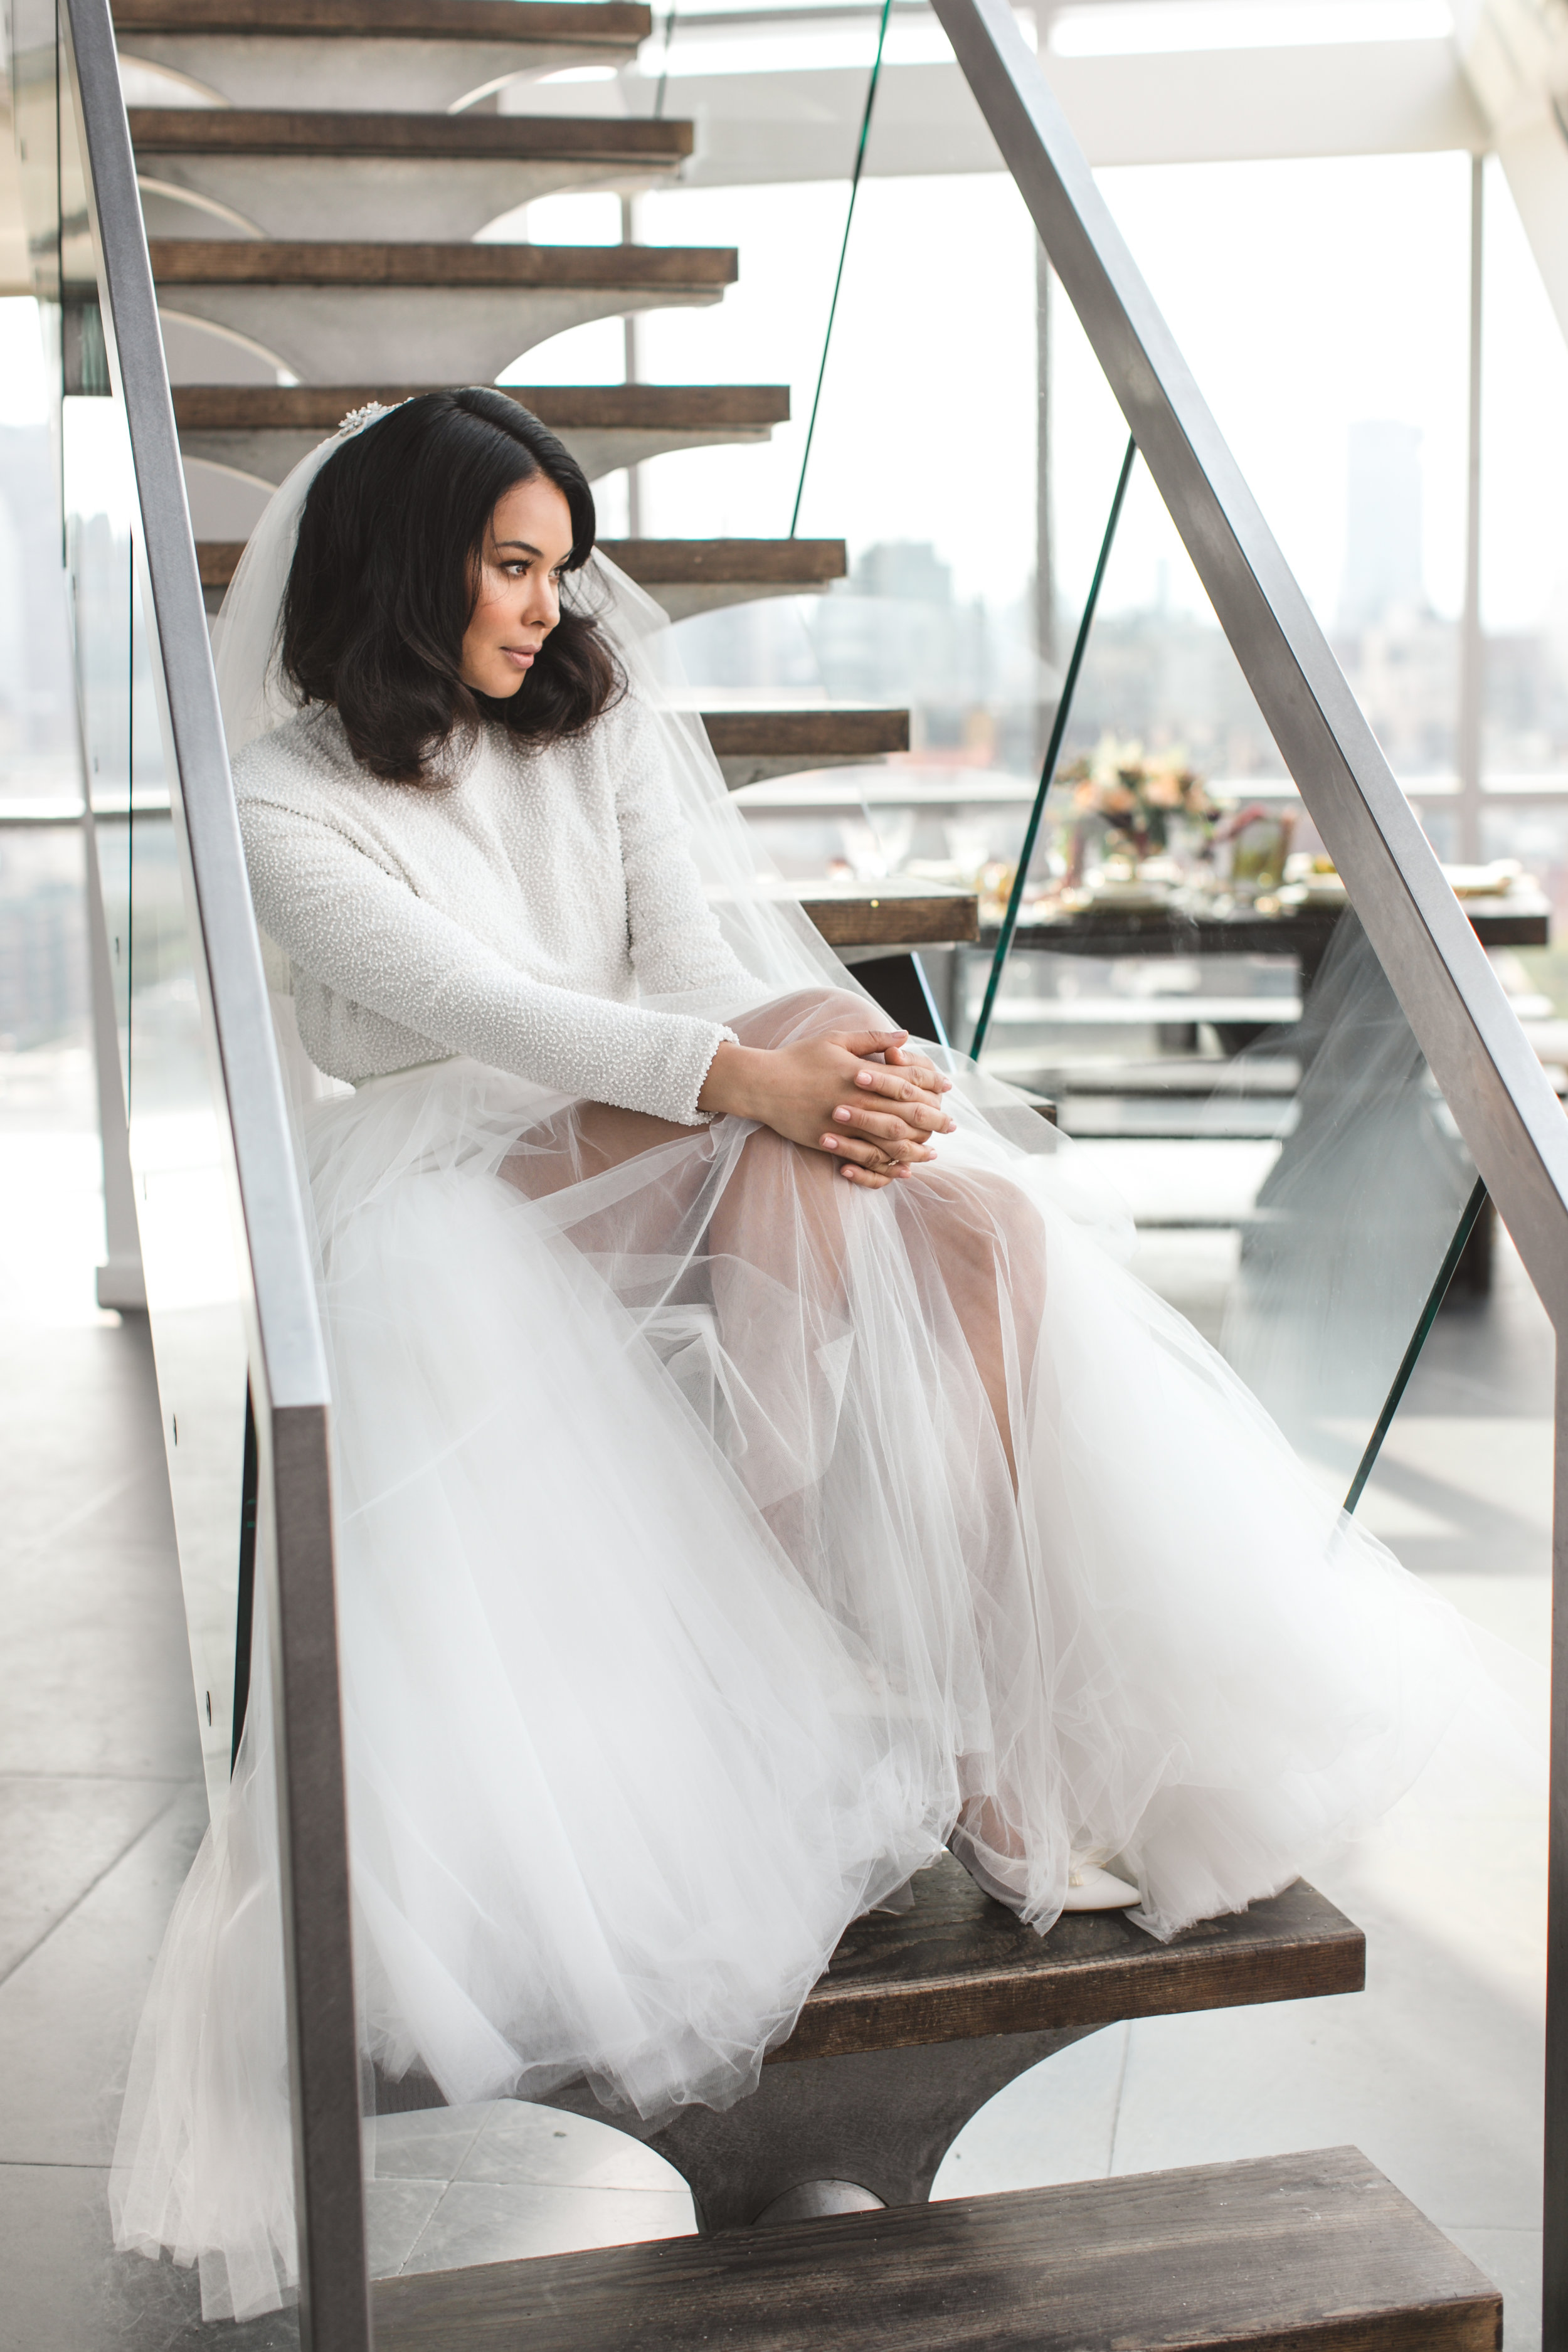 Nathalie Kraynina BrideBond_Girl_Bride_GinaEsposito-6.jpg